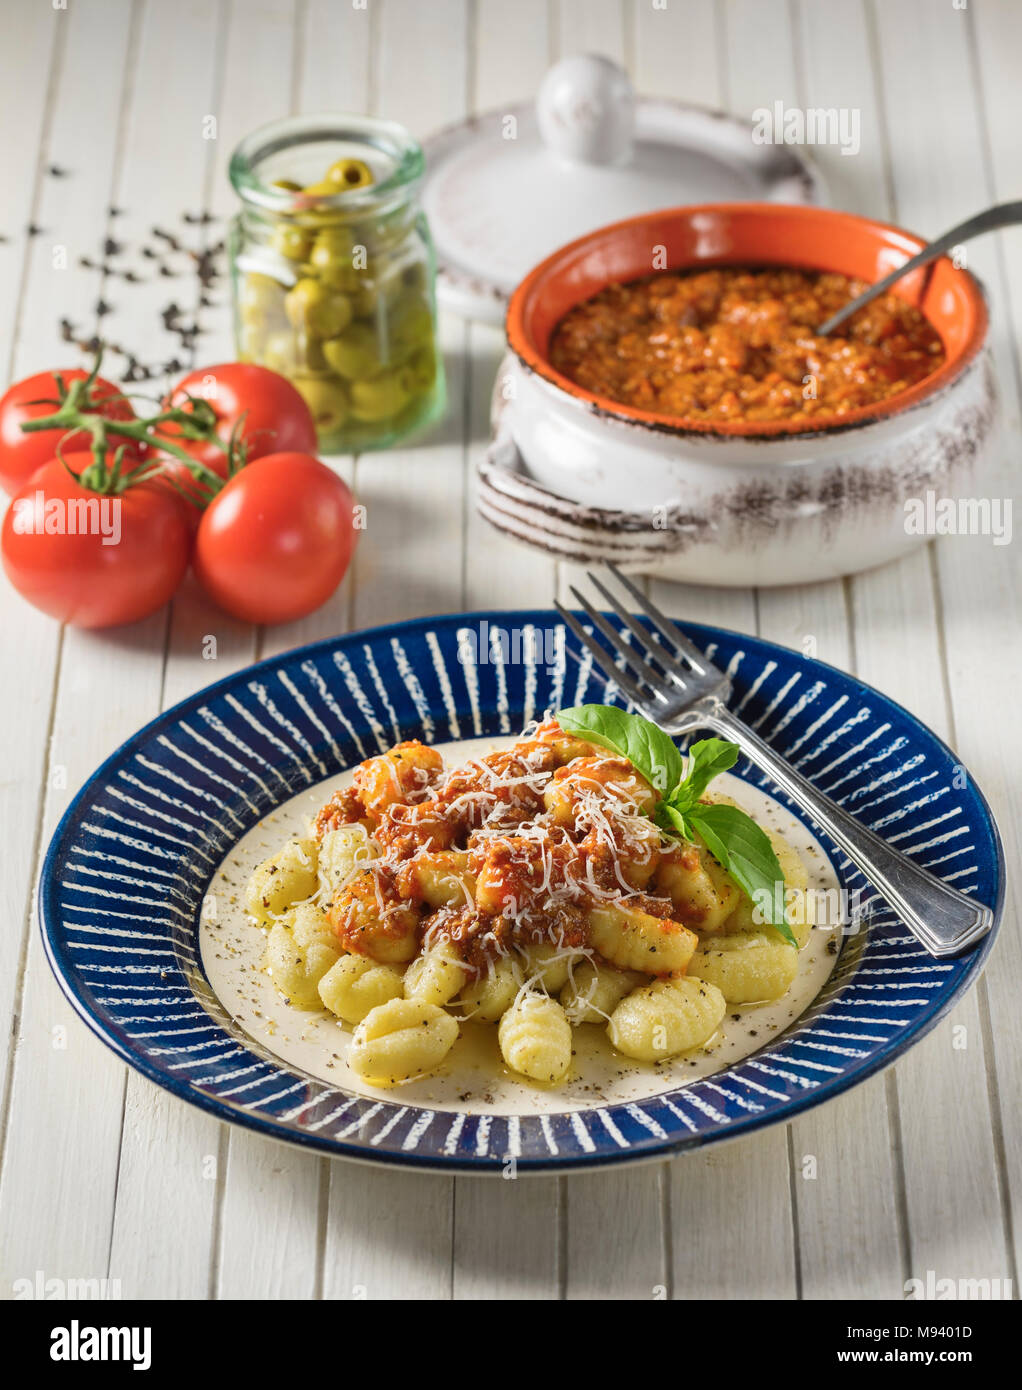 Gnocchi ragù. Italian potato dumplings with bolognese sauce. Italy Food - Stock Image